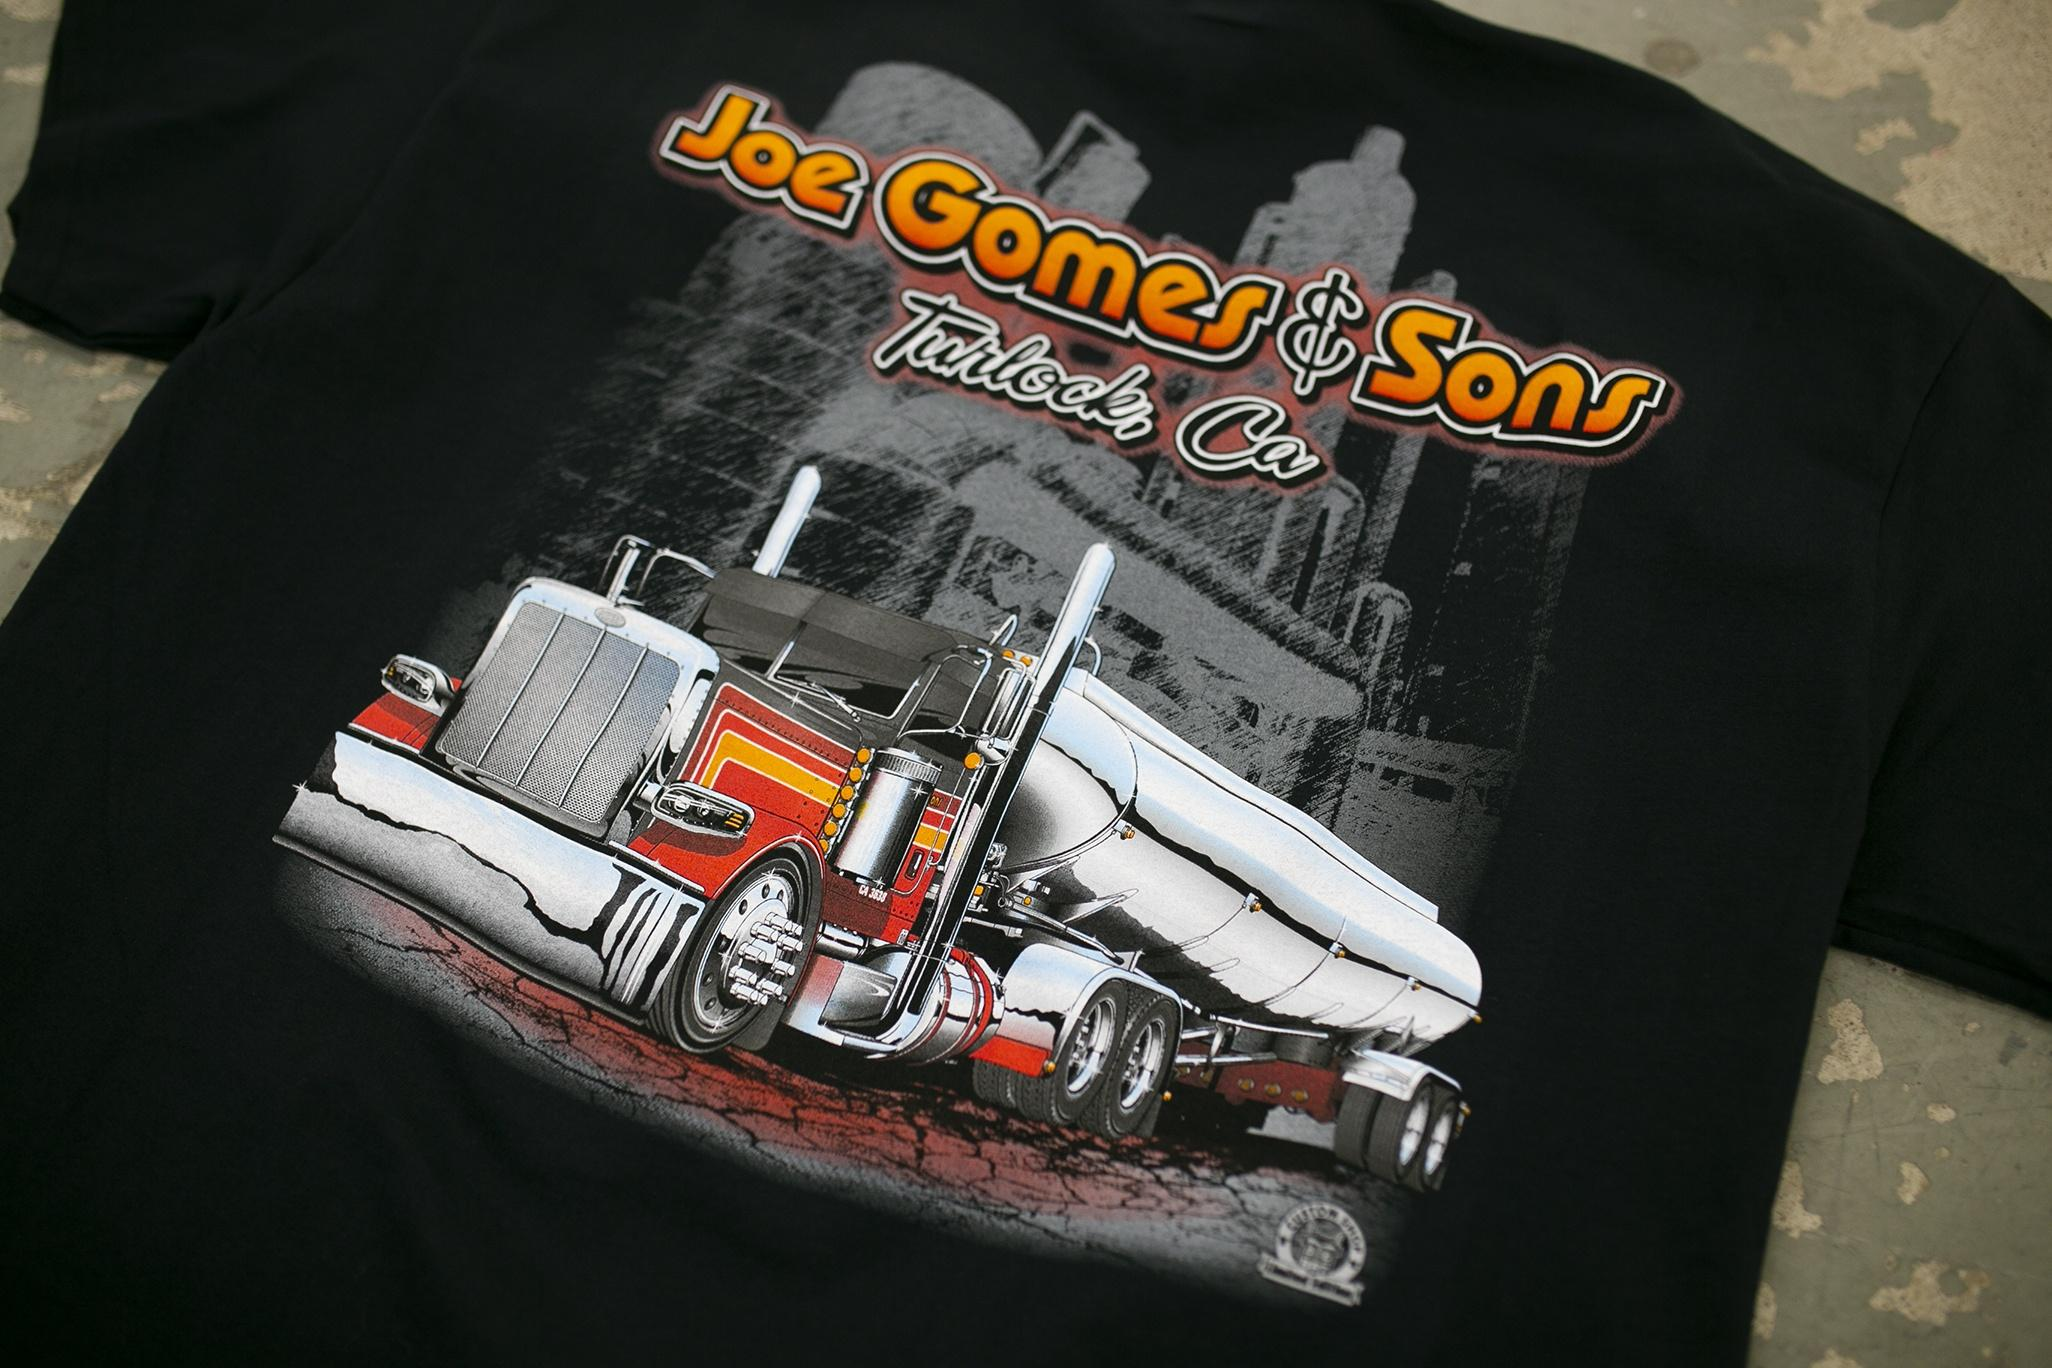 Custom: Joe Gomes & Sons –